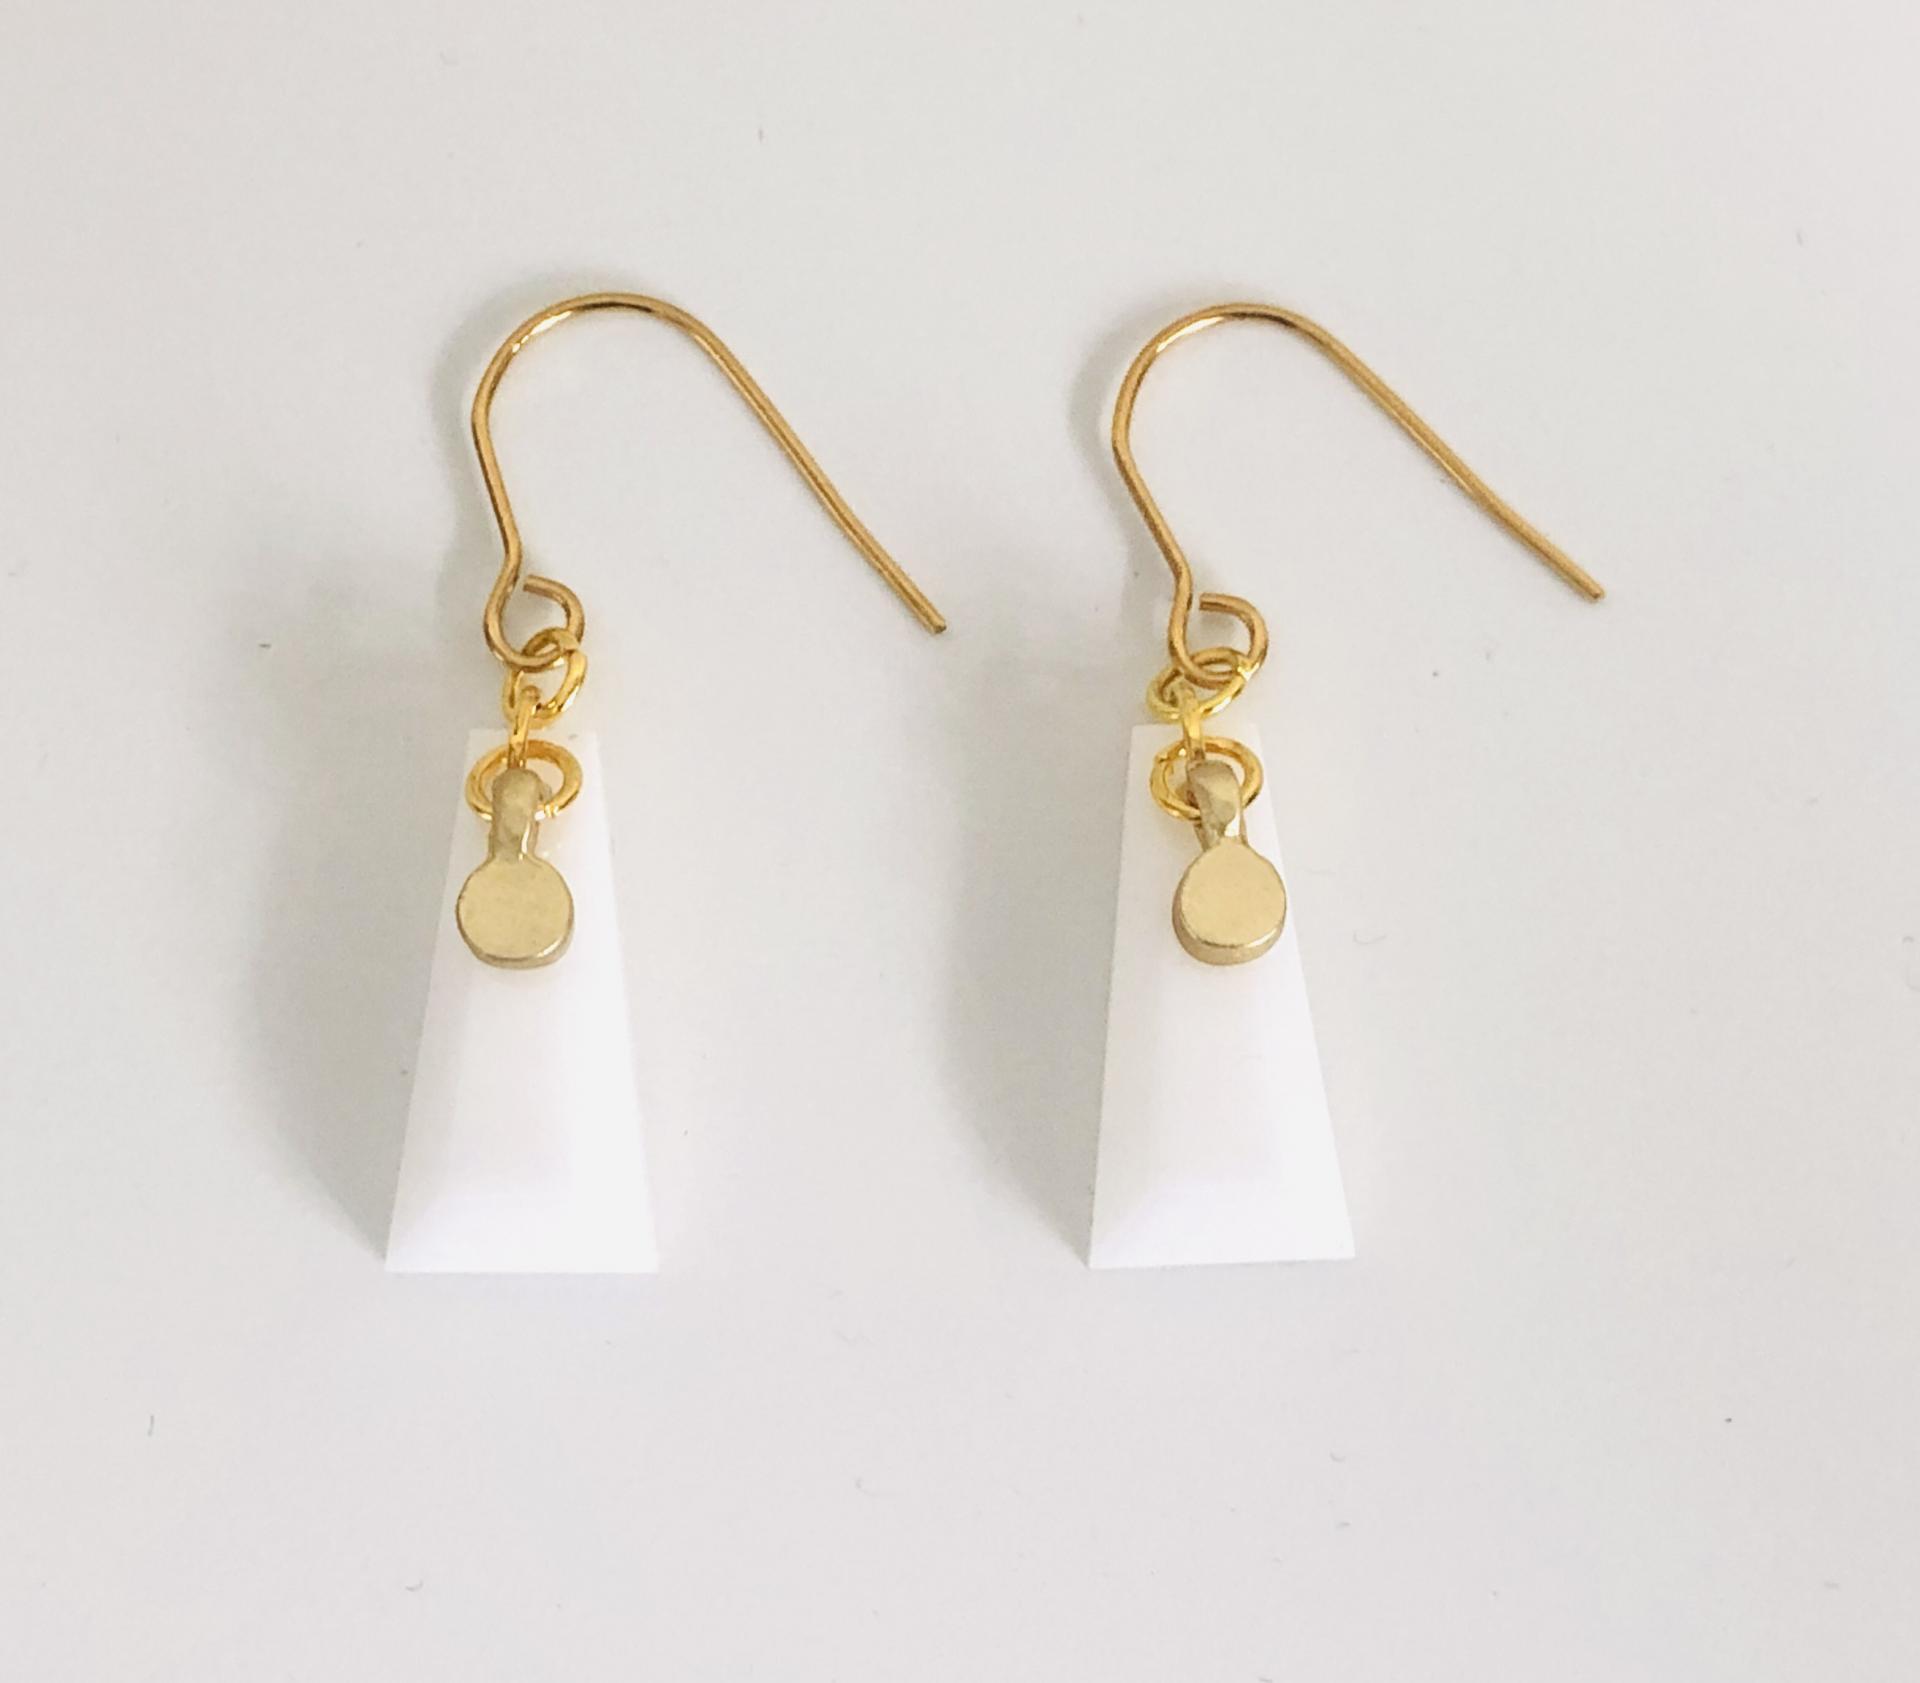 Pendientes dorados geométricos de resina blanca